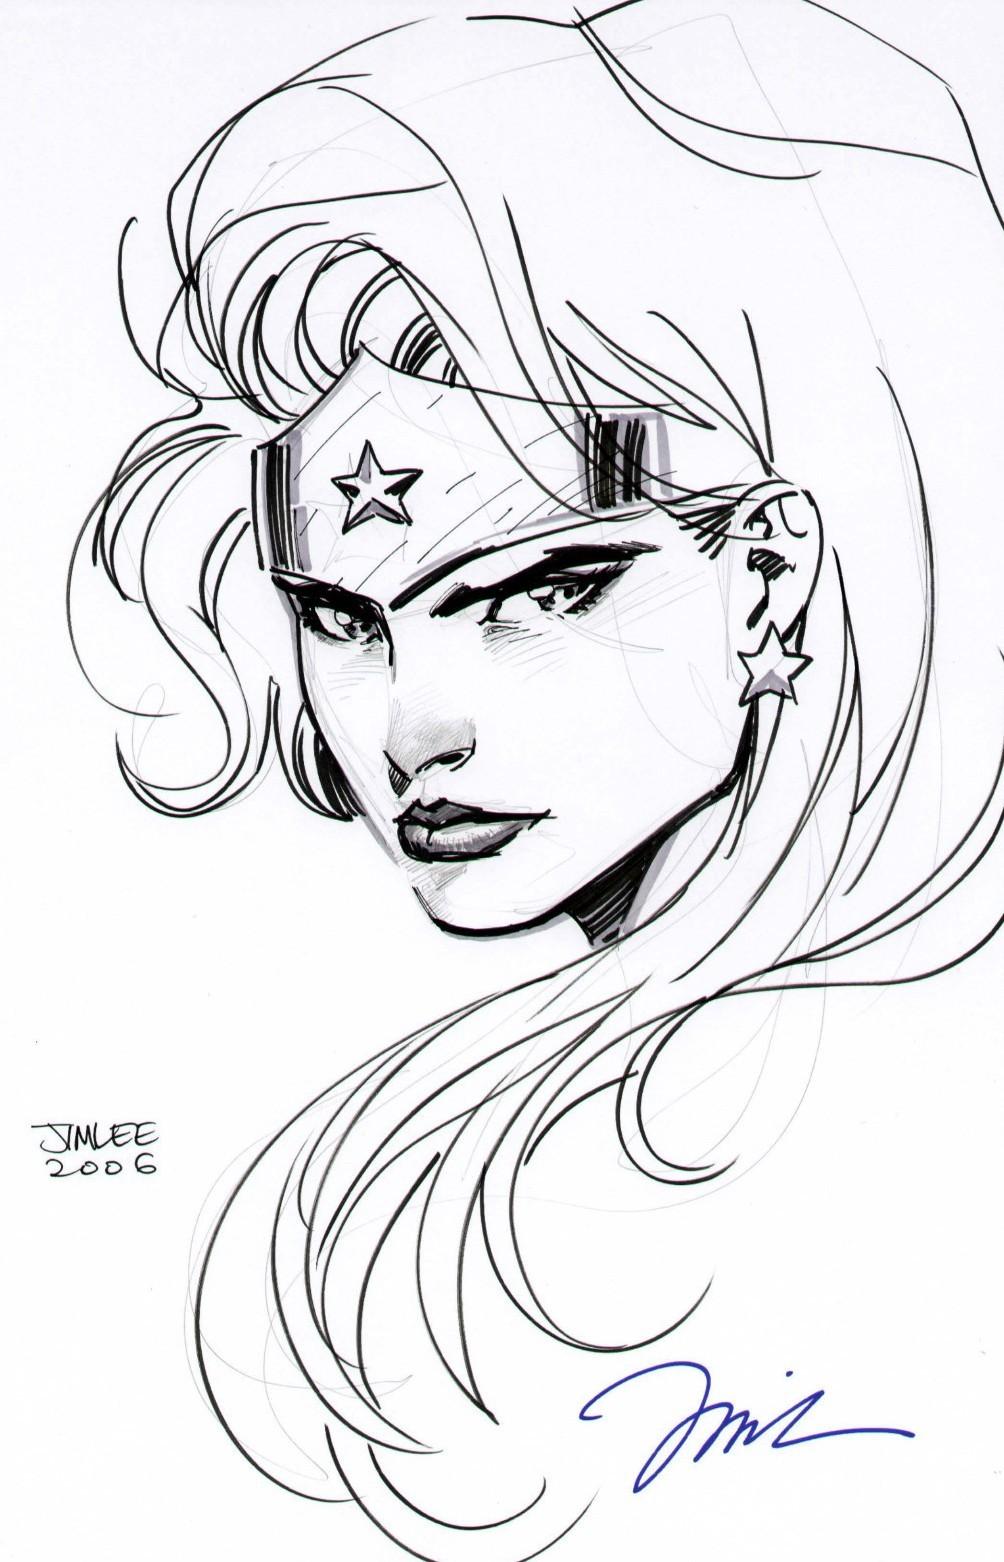 Wonder Woman pen & ink by Jim Lee • Alternate World Comics